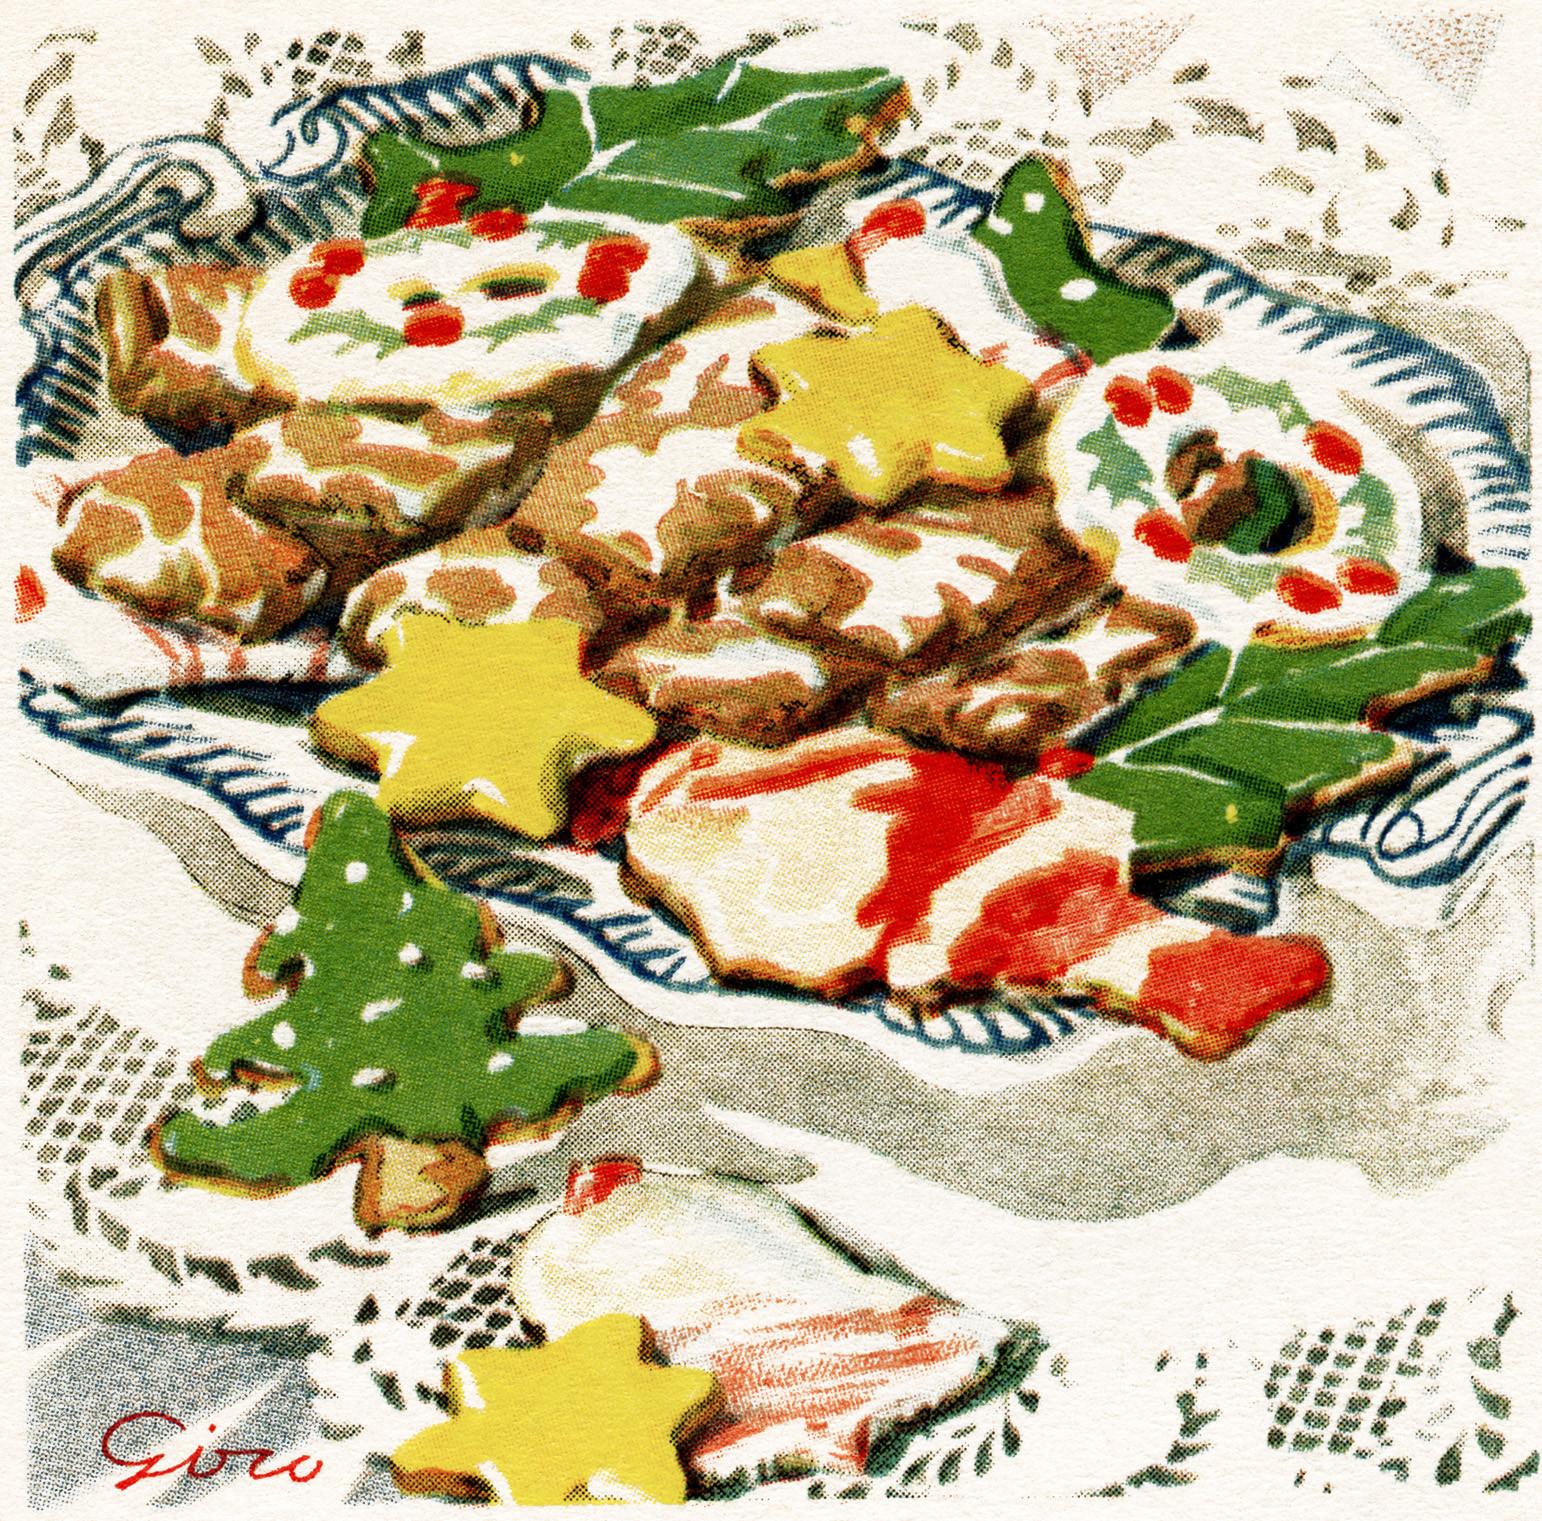 Christmas Baking Goods Recipes  Christmas Baking Recipes